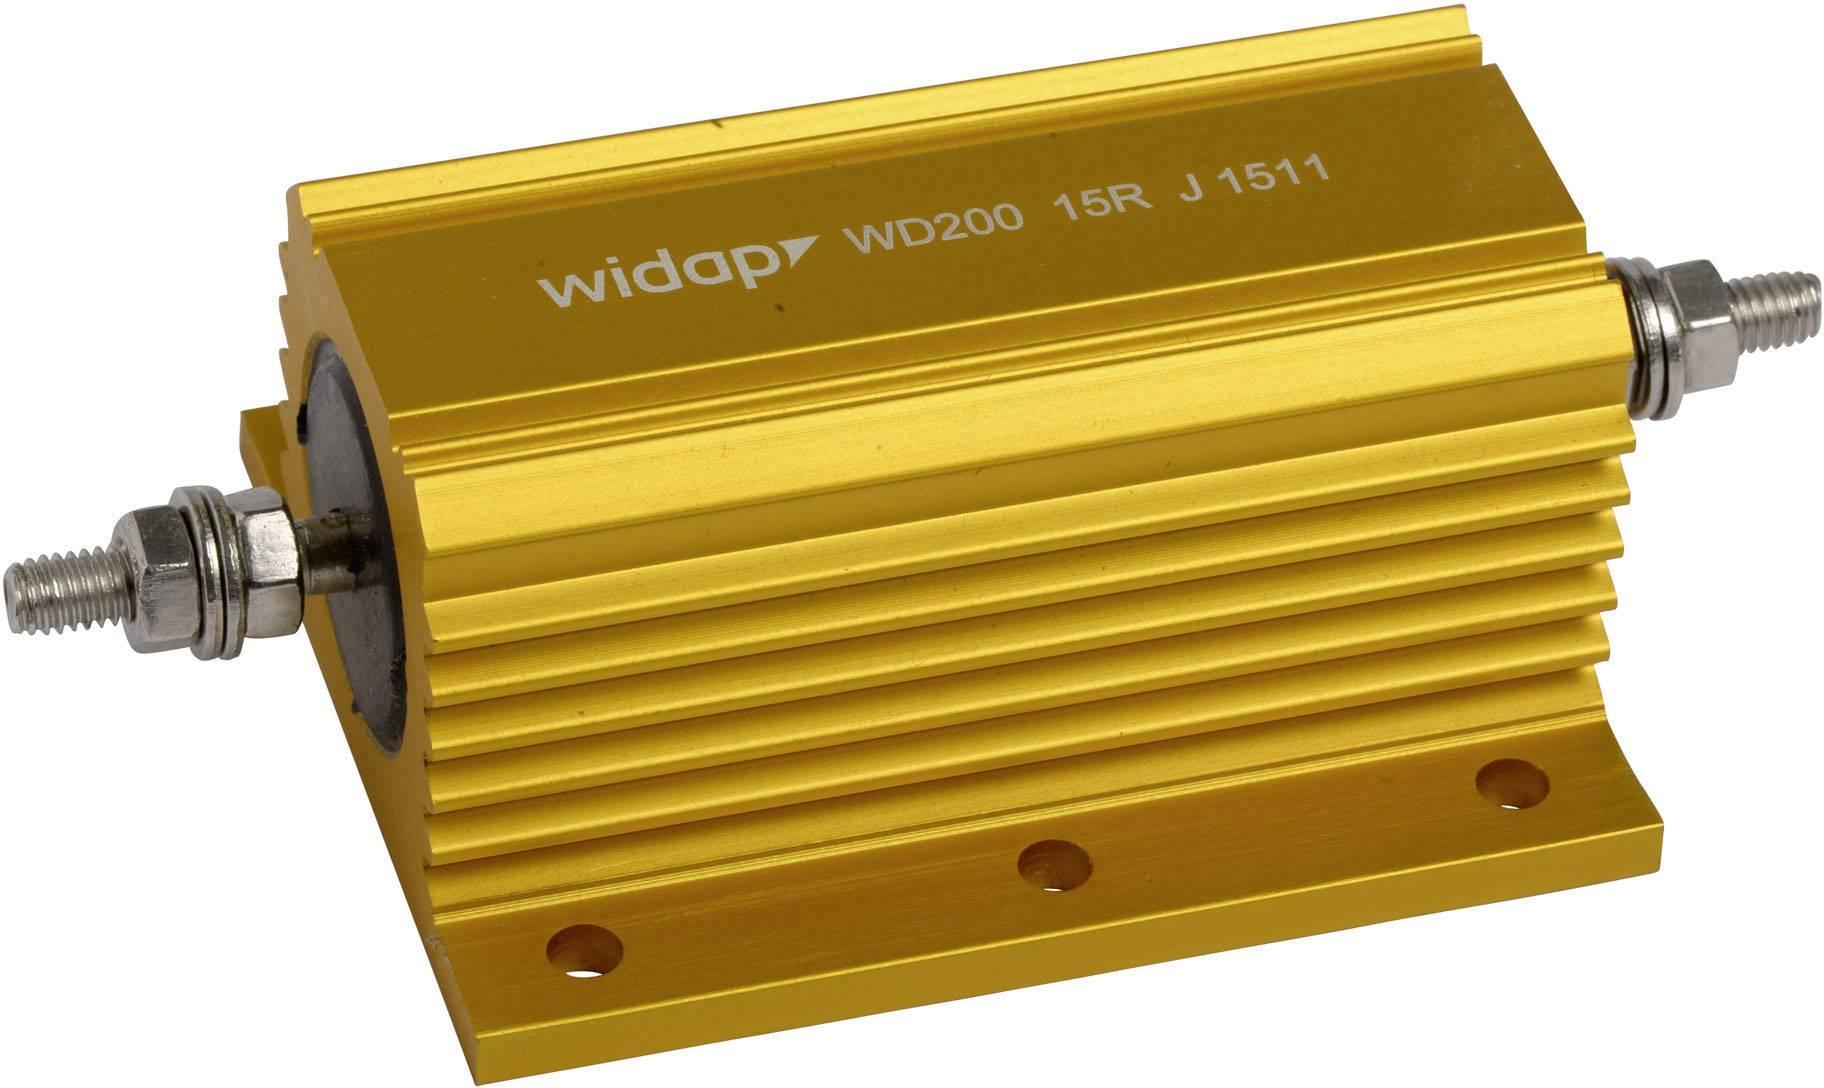 Drôtový rezistor Widap 160172, hodnota odporu 6.8 Ohm, 300 W, 1 ks